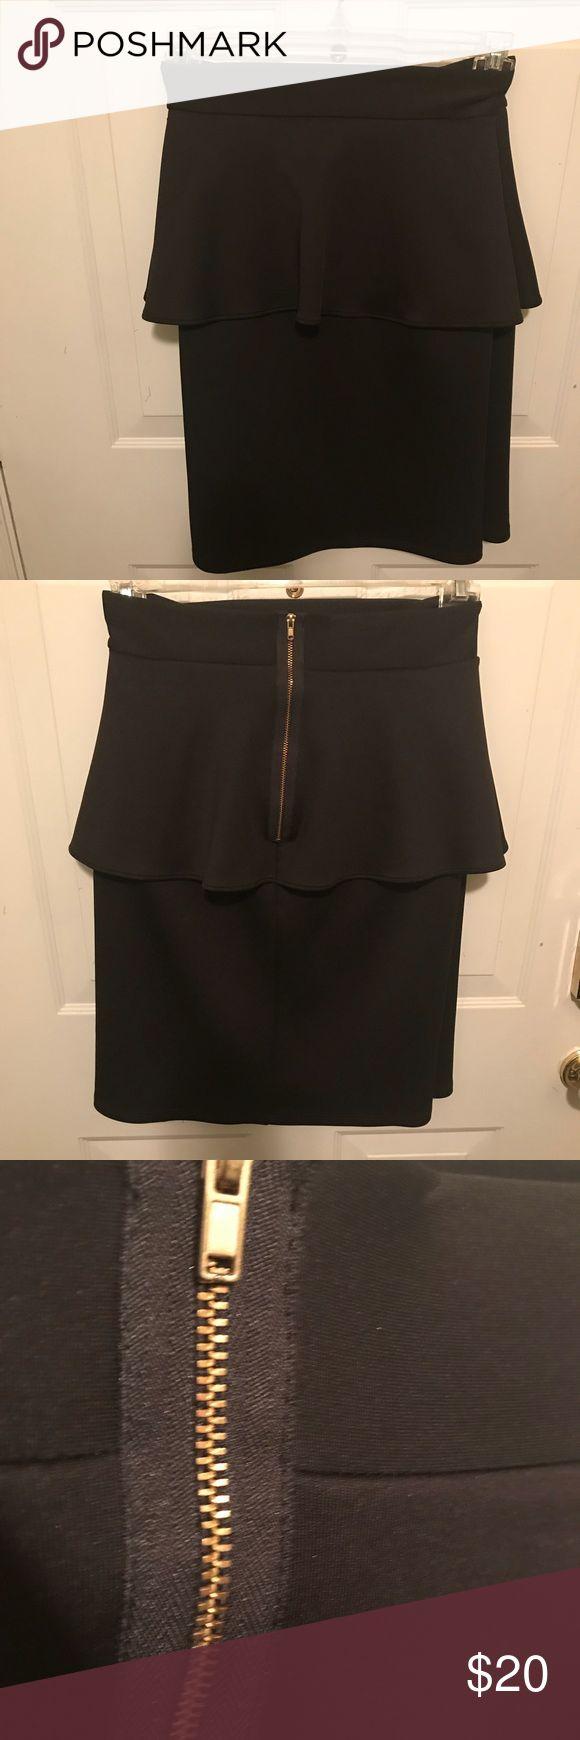 Ashley Stewart Peplum Skirt Ashley Stewart Black Peplum Skirt- with gold zipper in back -excellent condition-runs big -size 24 Ashley Stewart Skirts Pencil